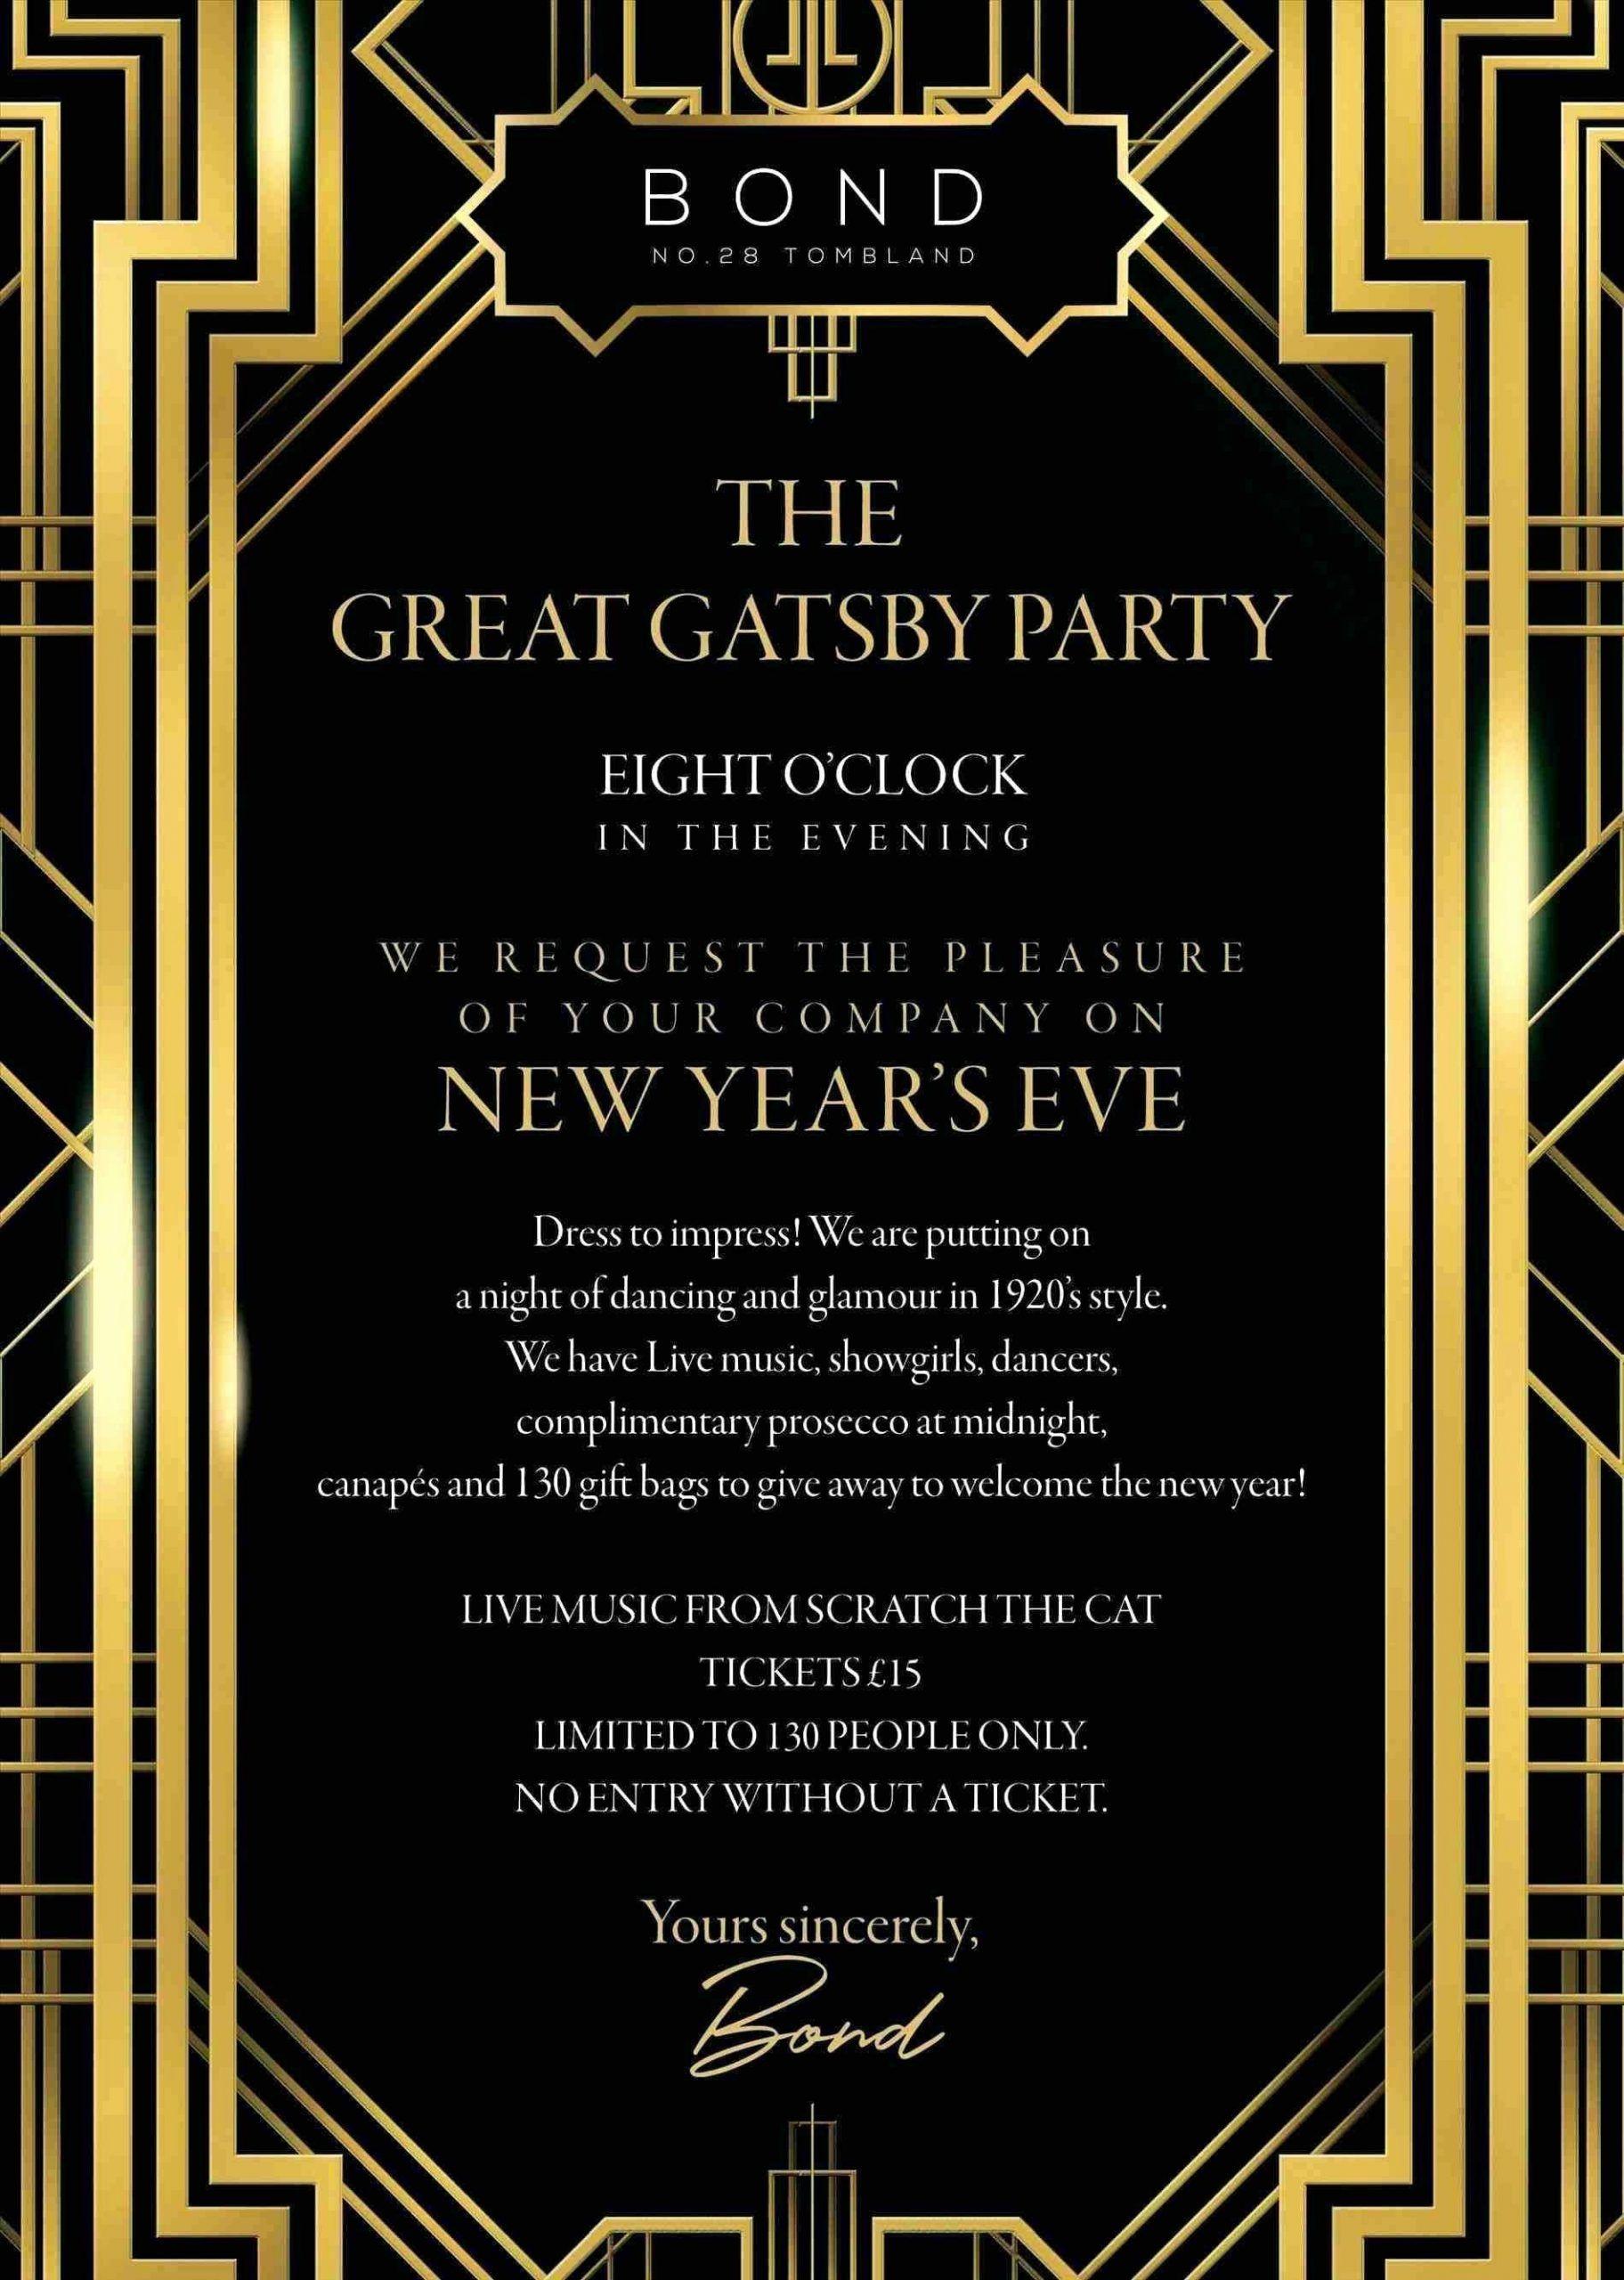 5s Invitation Template Free  Great gatsby invitation, Gatsby